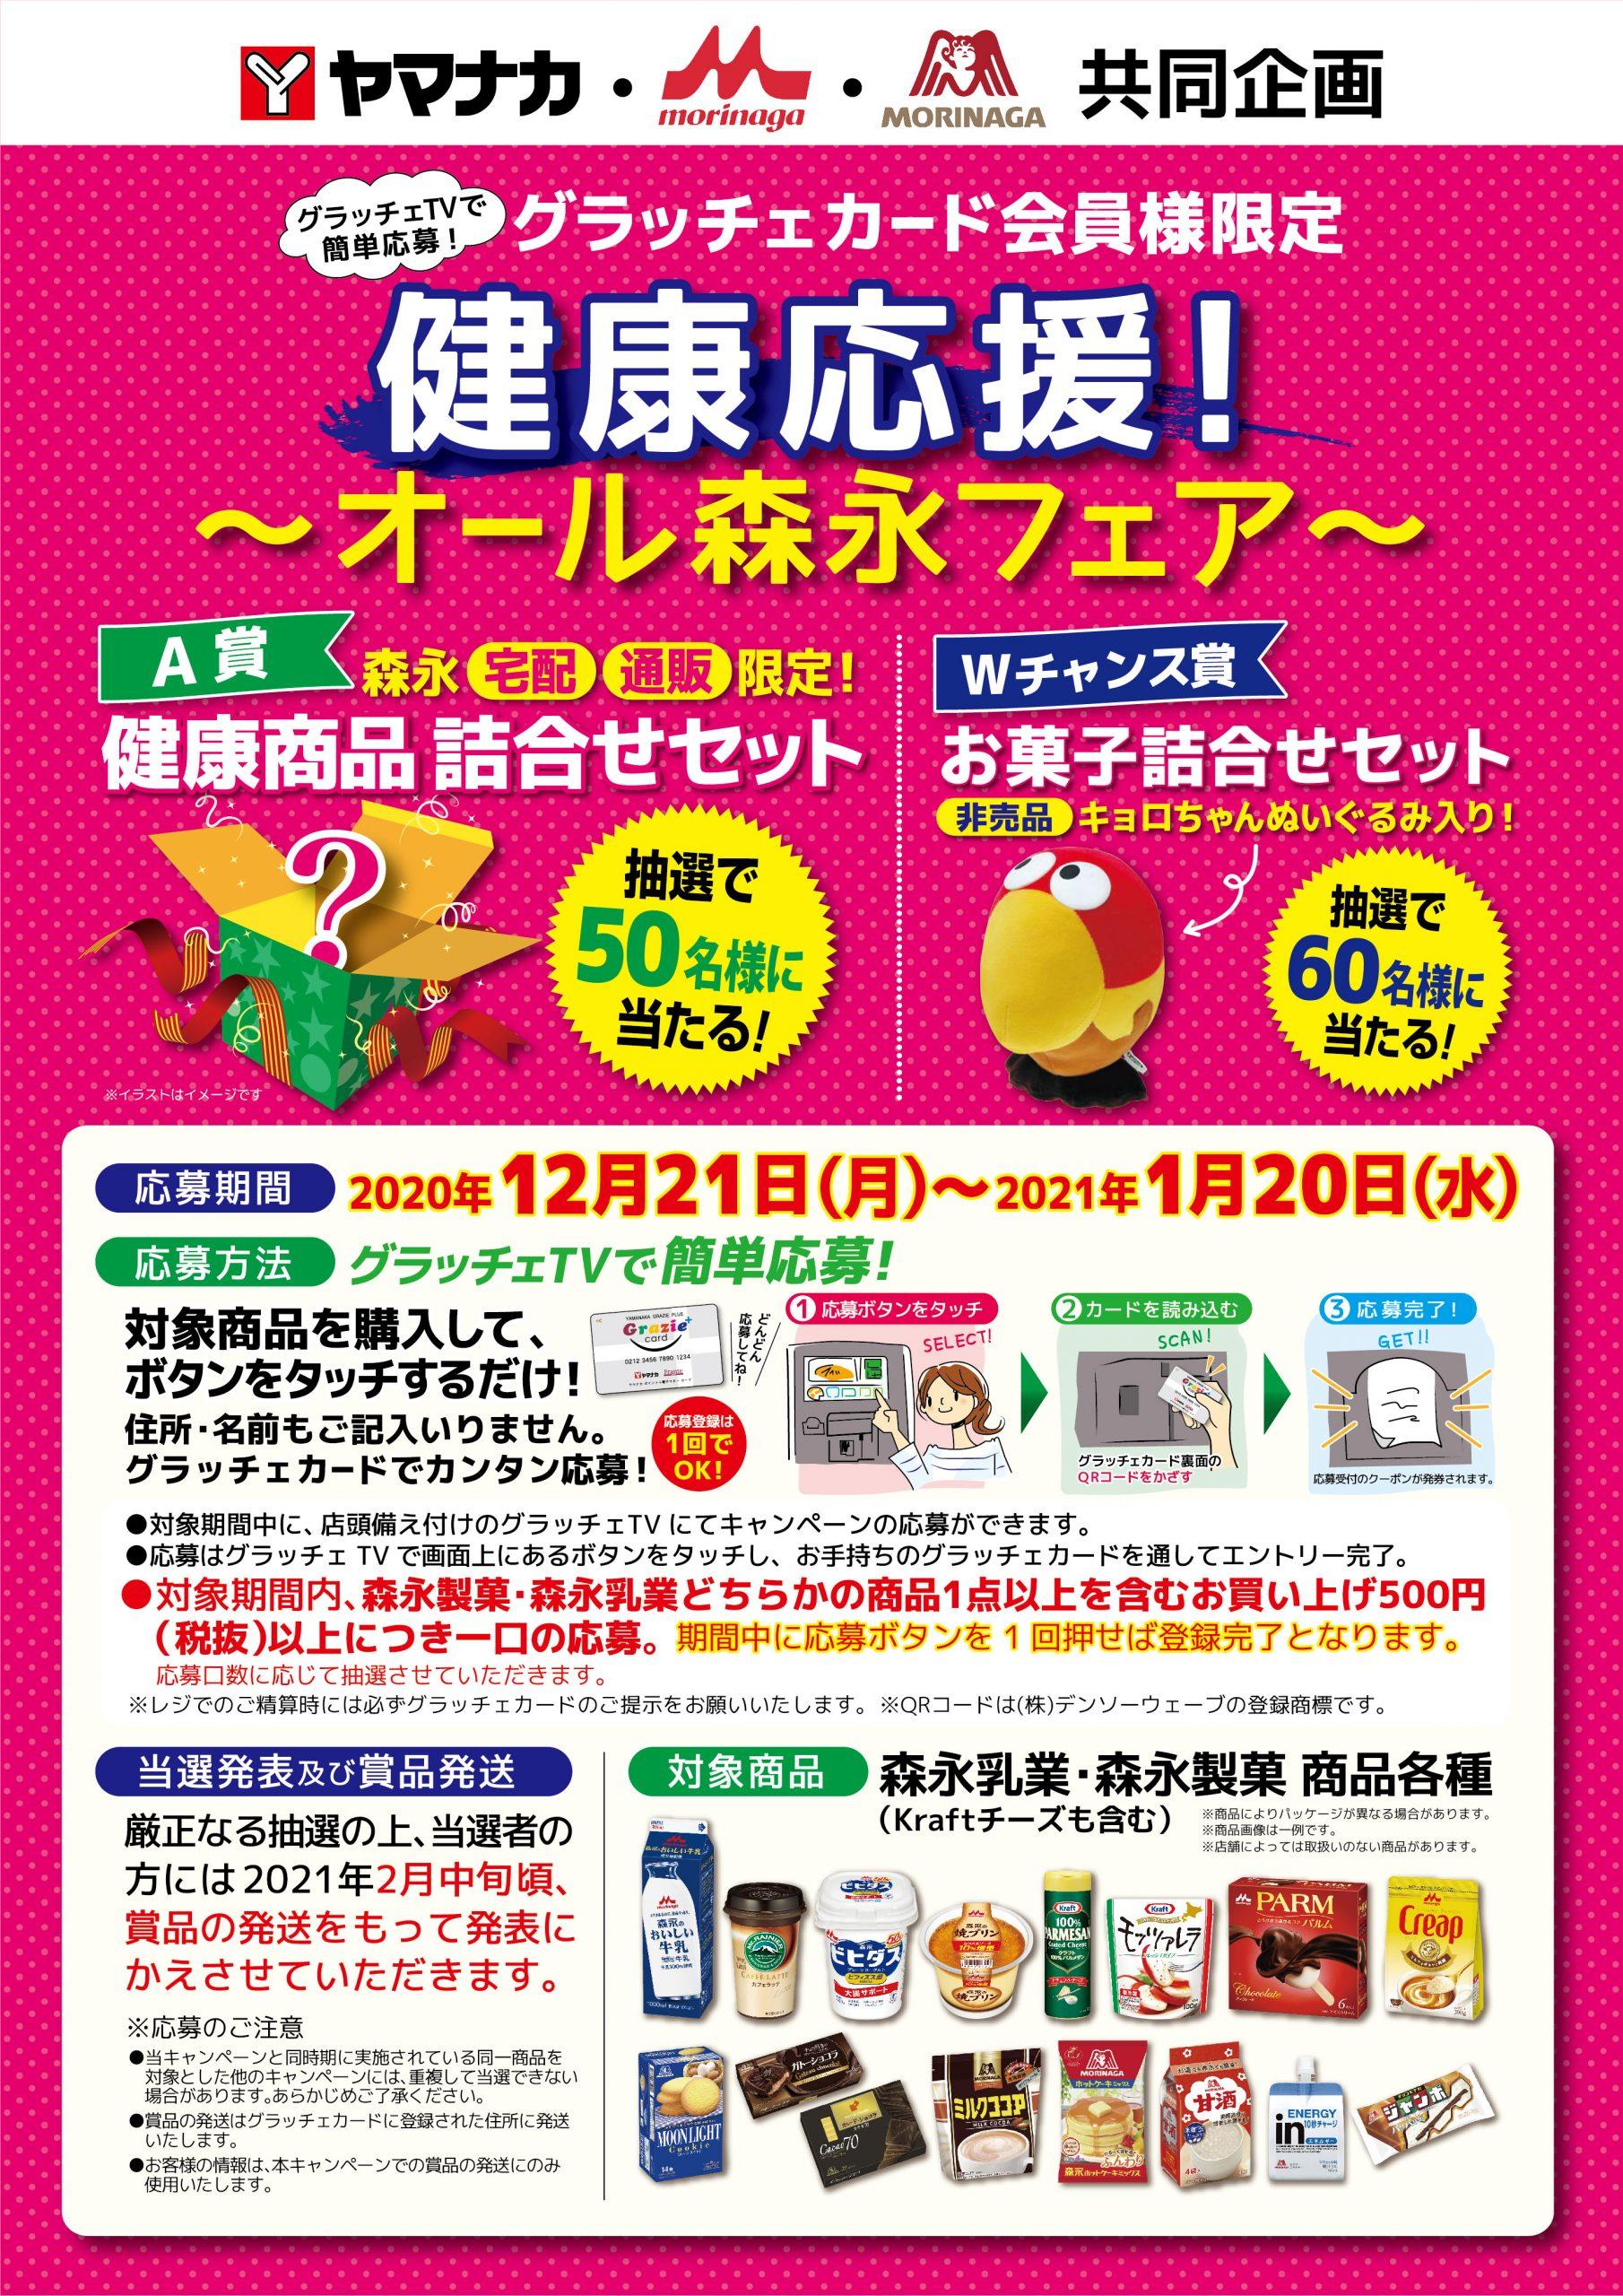 https://www.super-yamanaka.co.jp/wp/super/wp-content/uploads/2020/12/1221morinaga-scaled.jpg